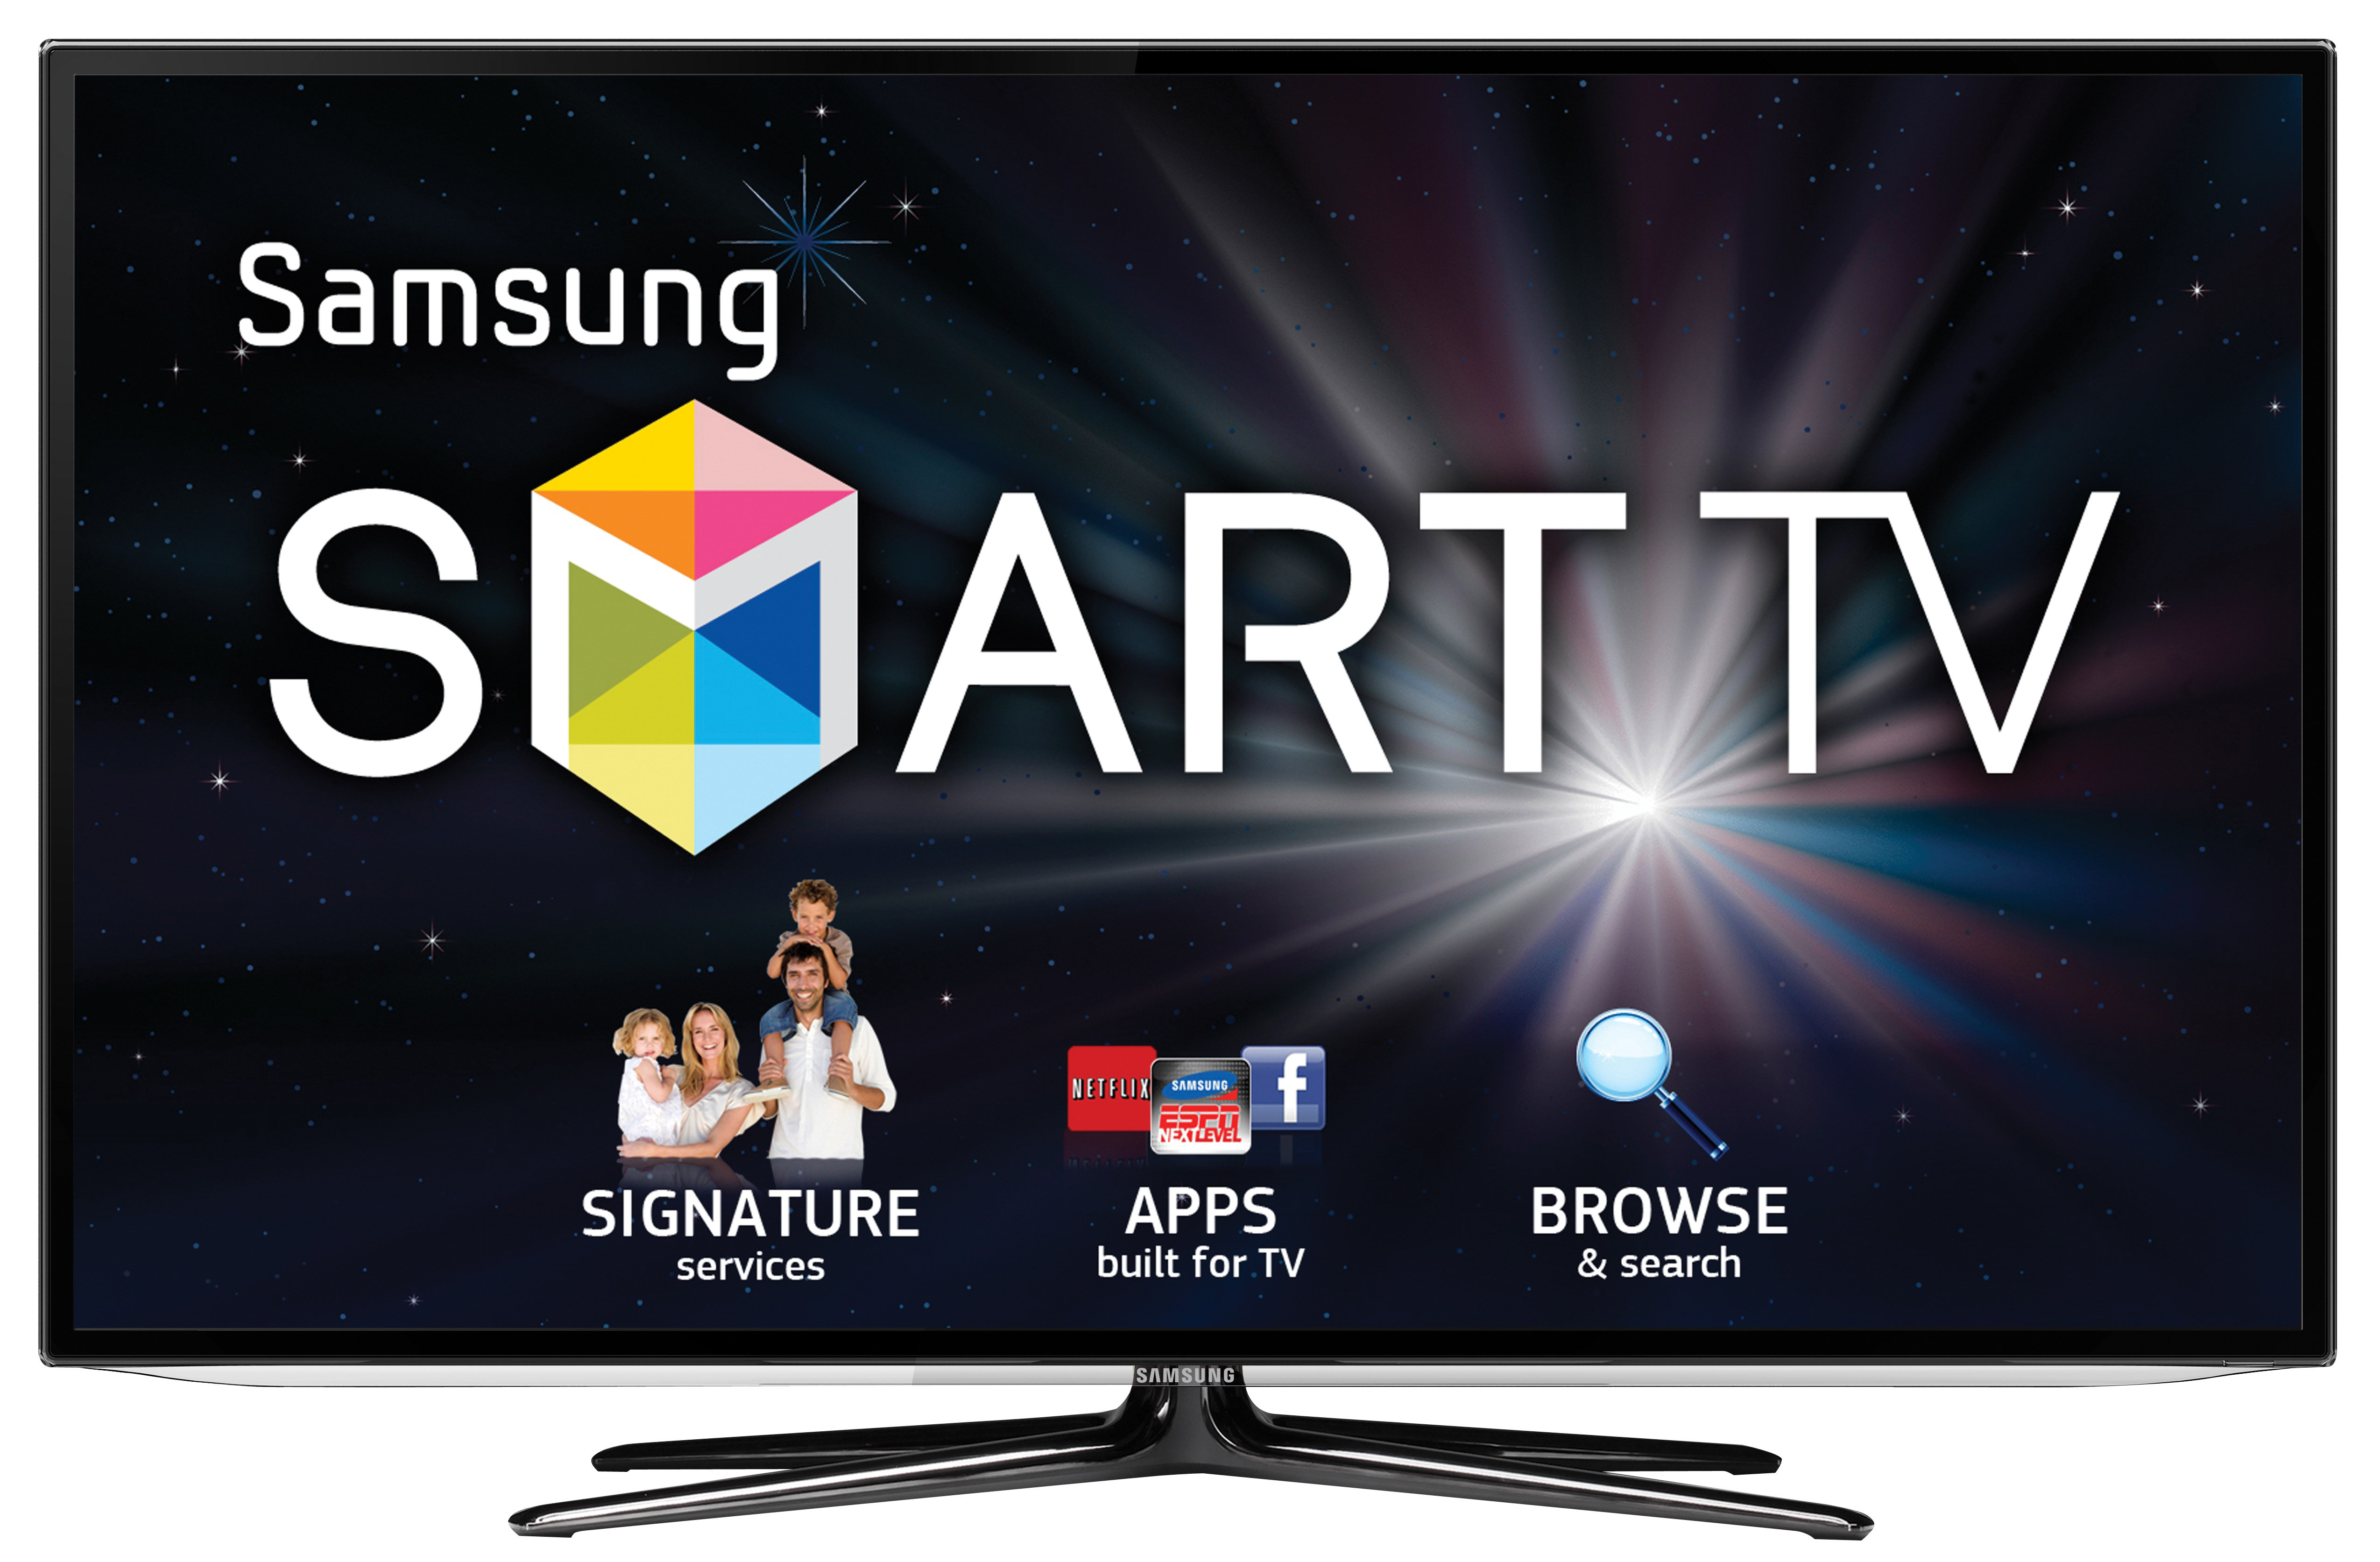 Scaricare App su Smart Tv Samsung